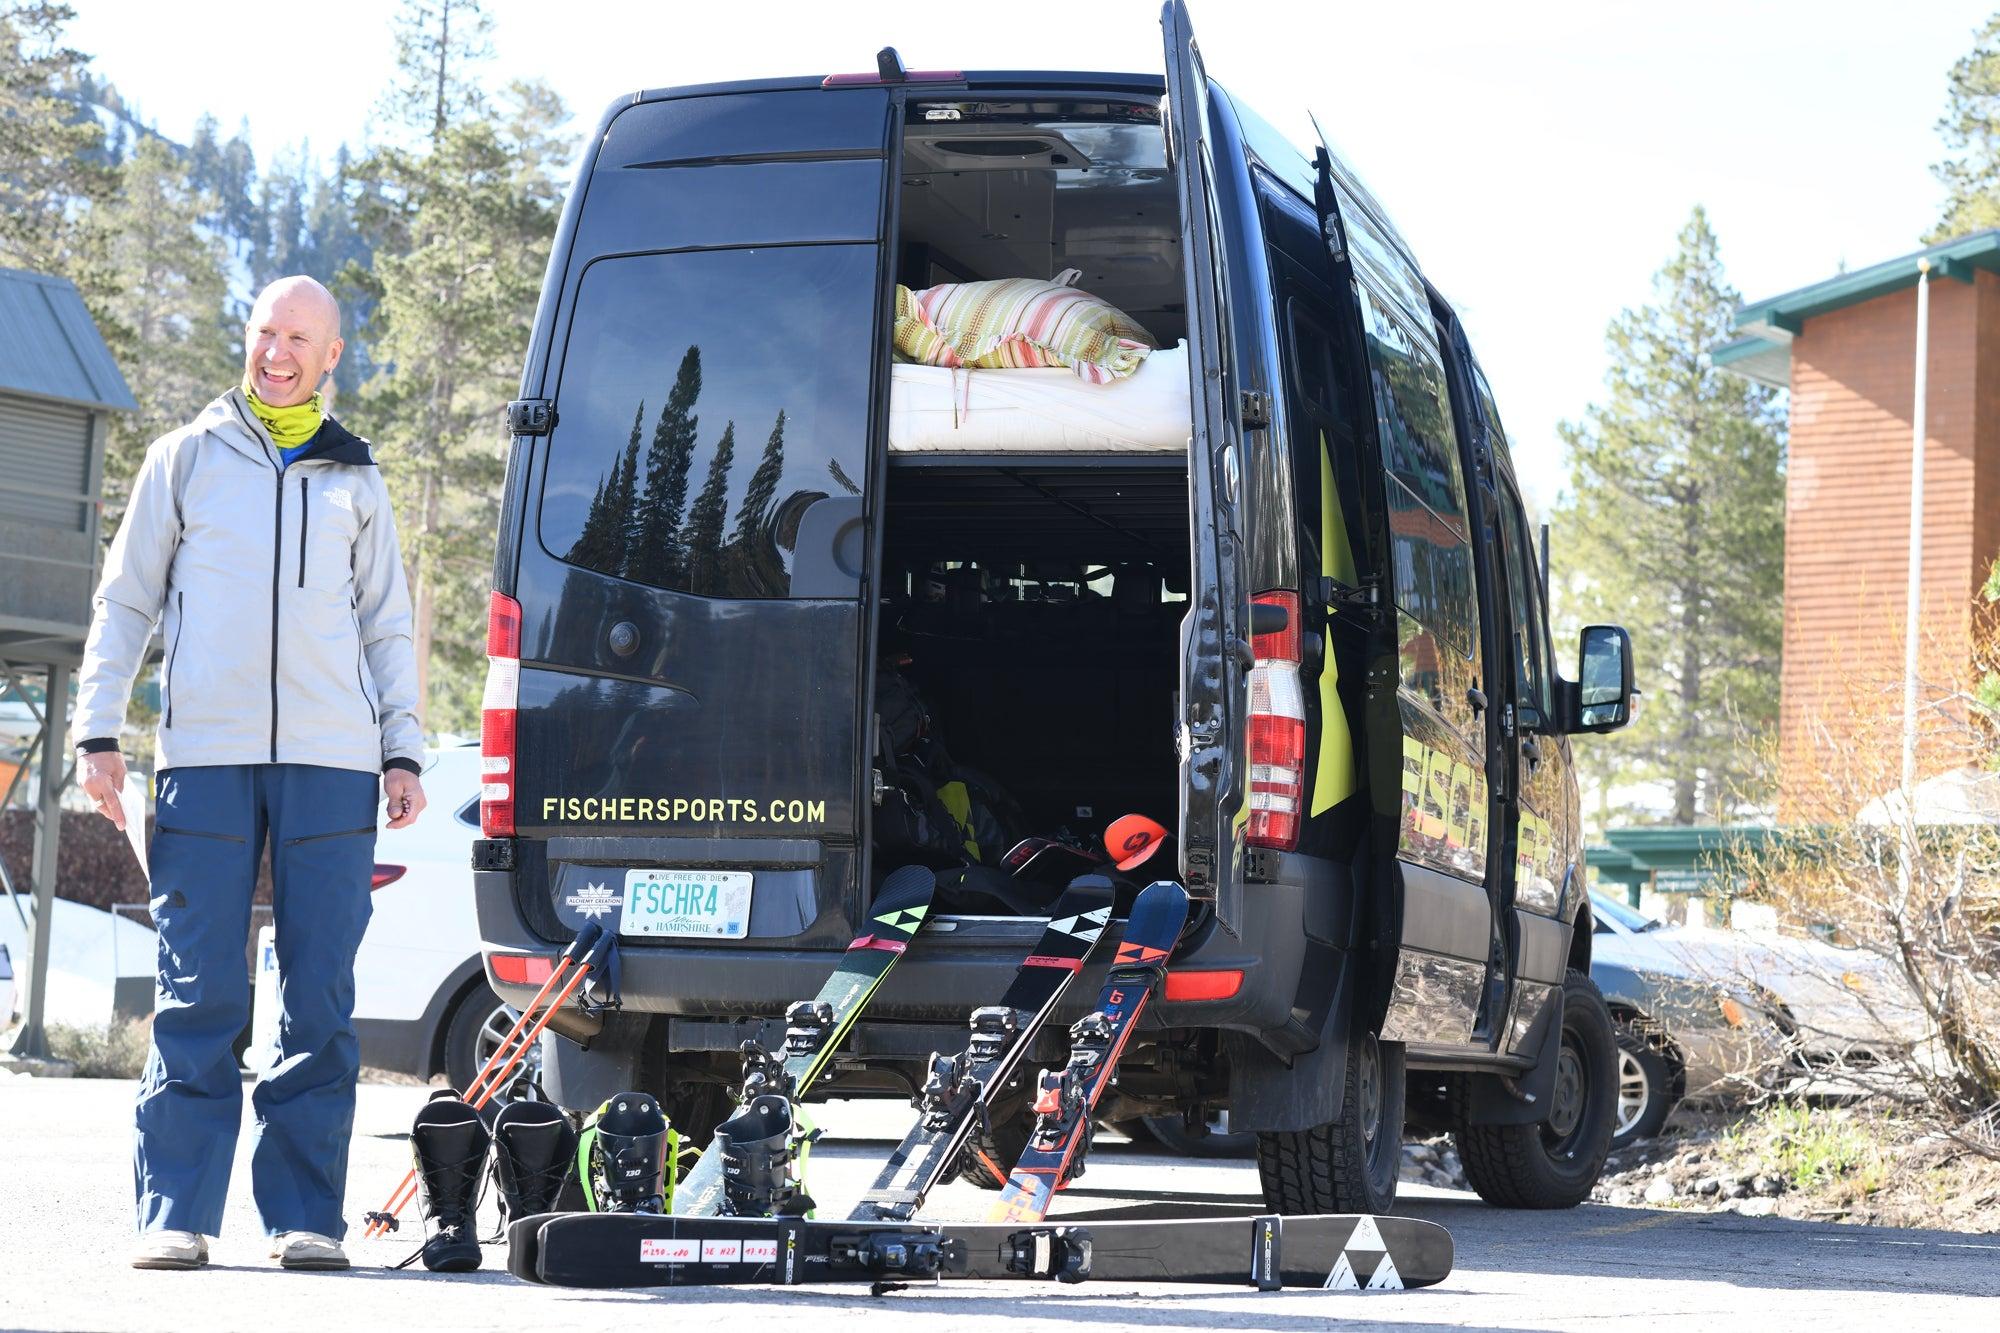 Mike Hattrup and his sprinter van